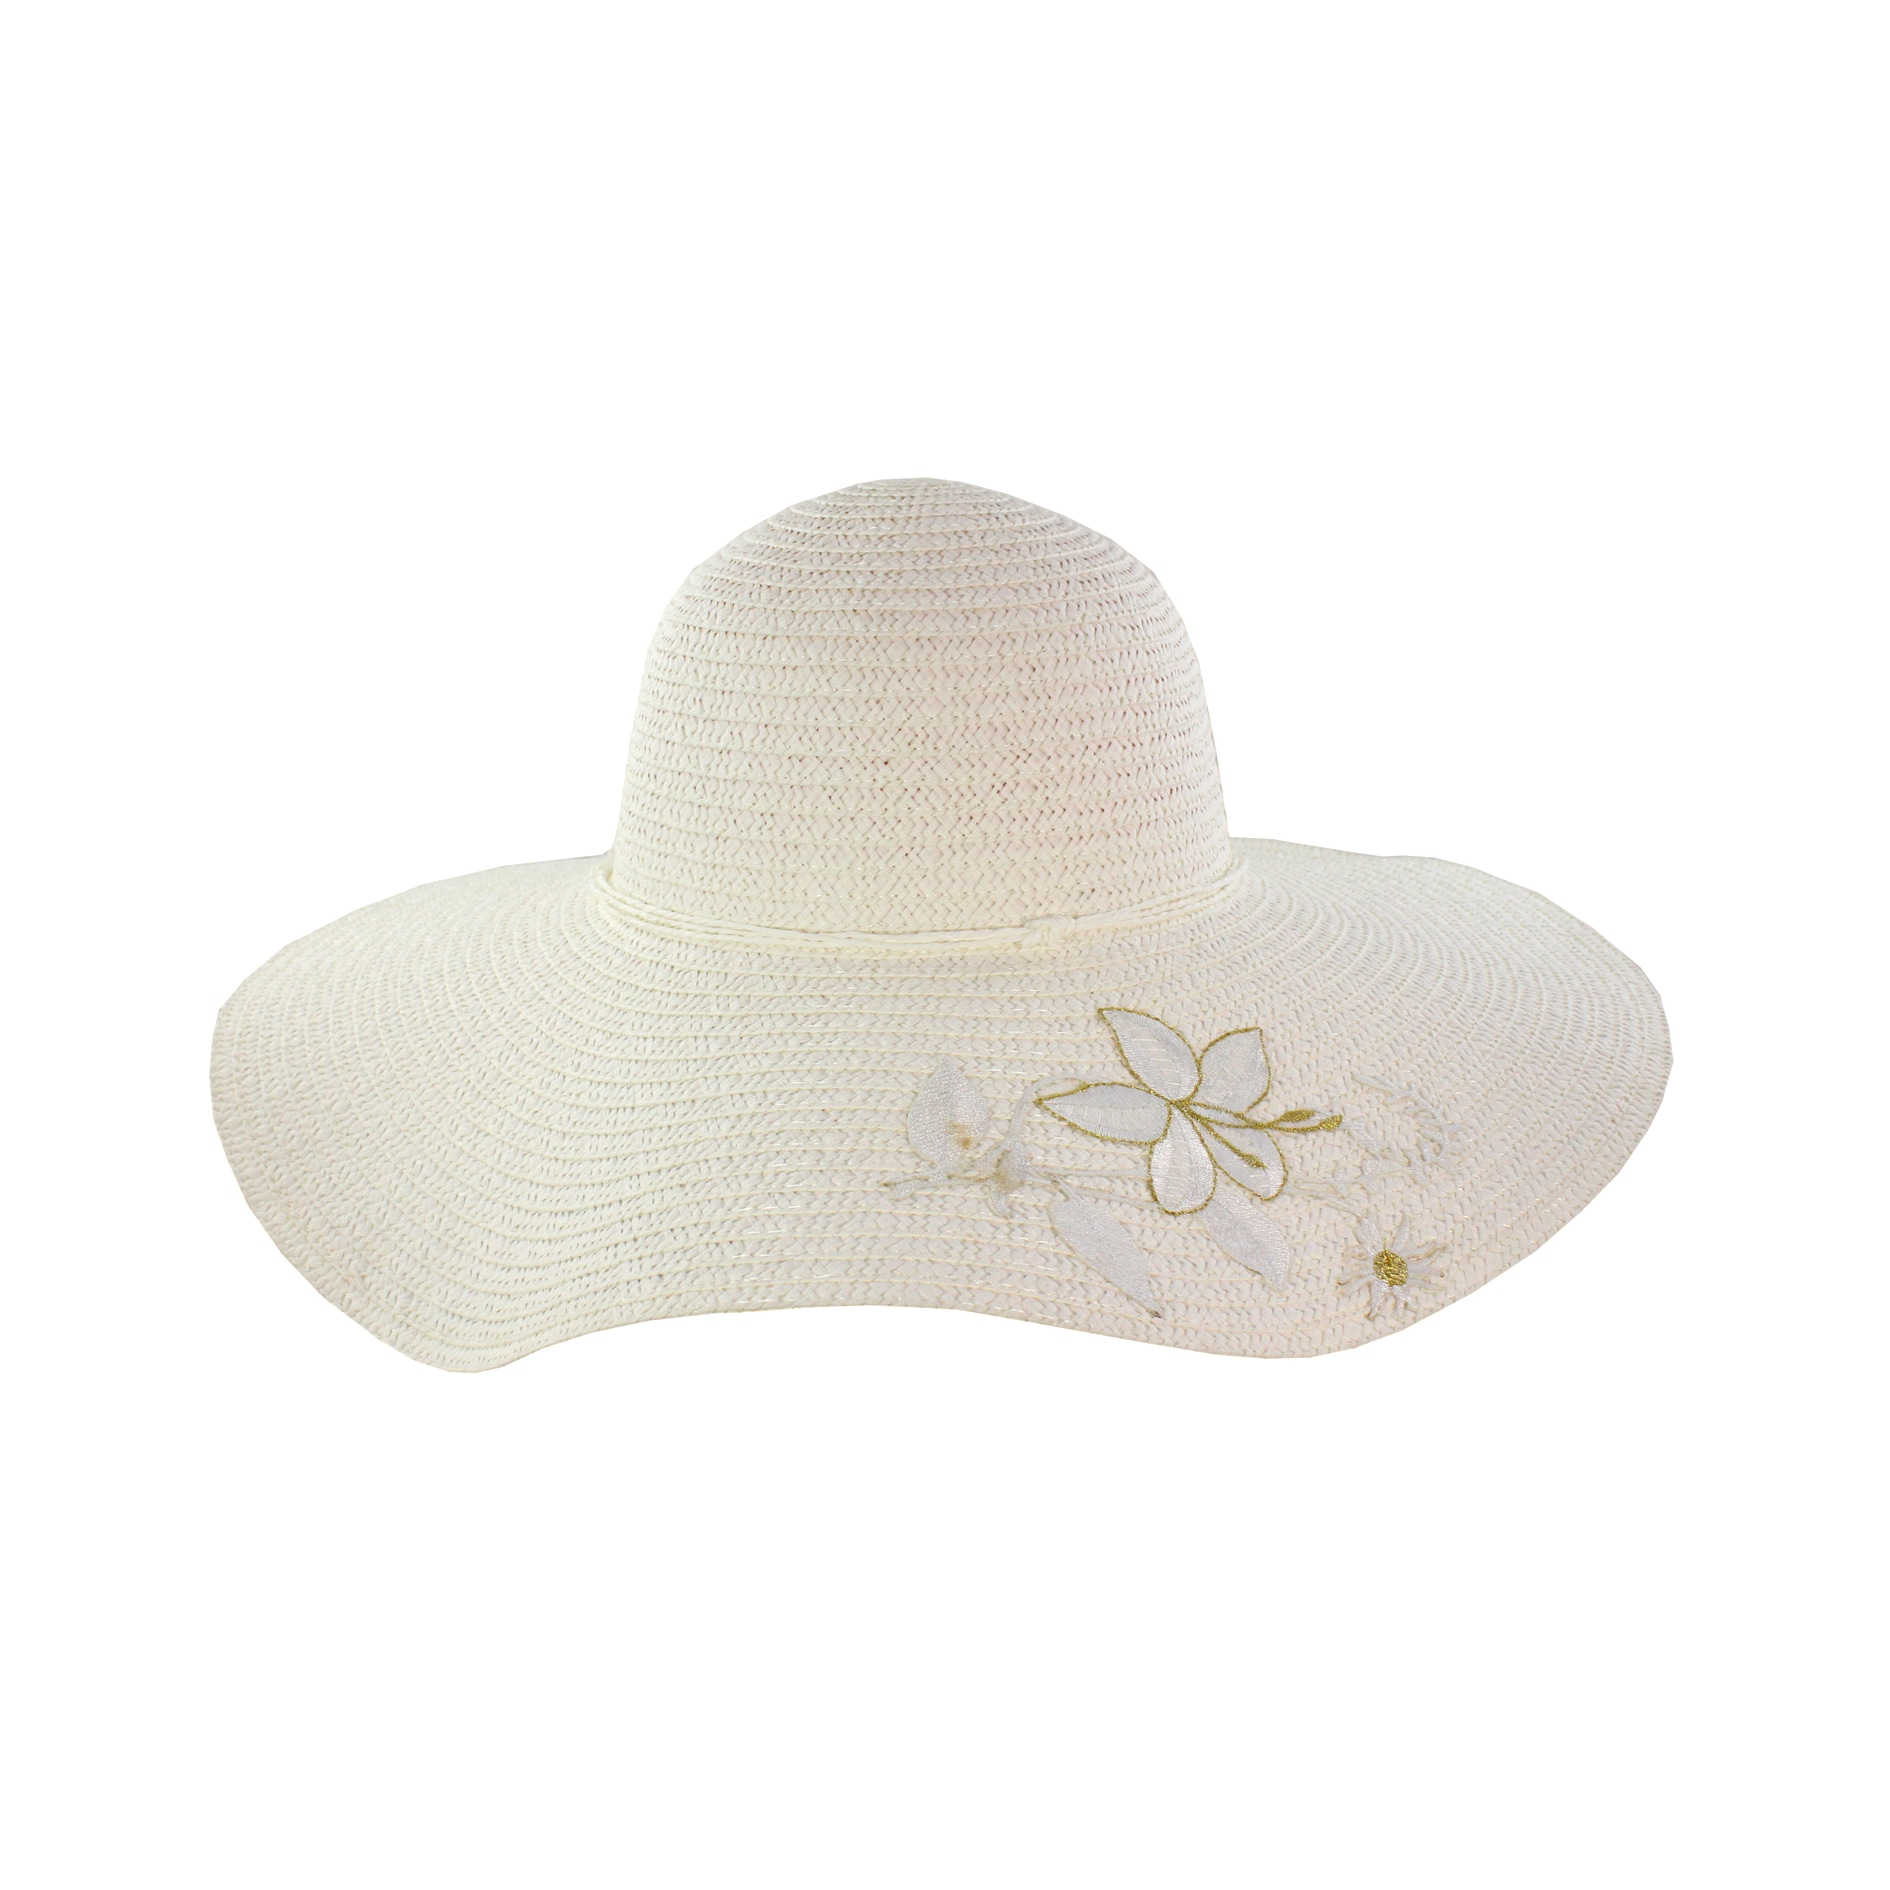 Faddism Women's White Flower Straw Sun Hat